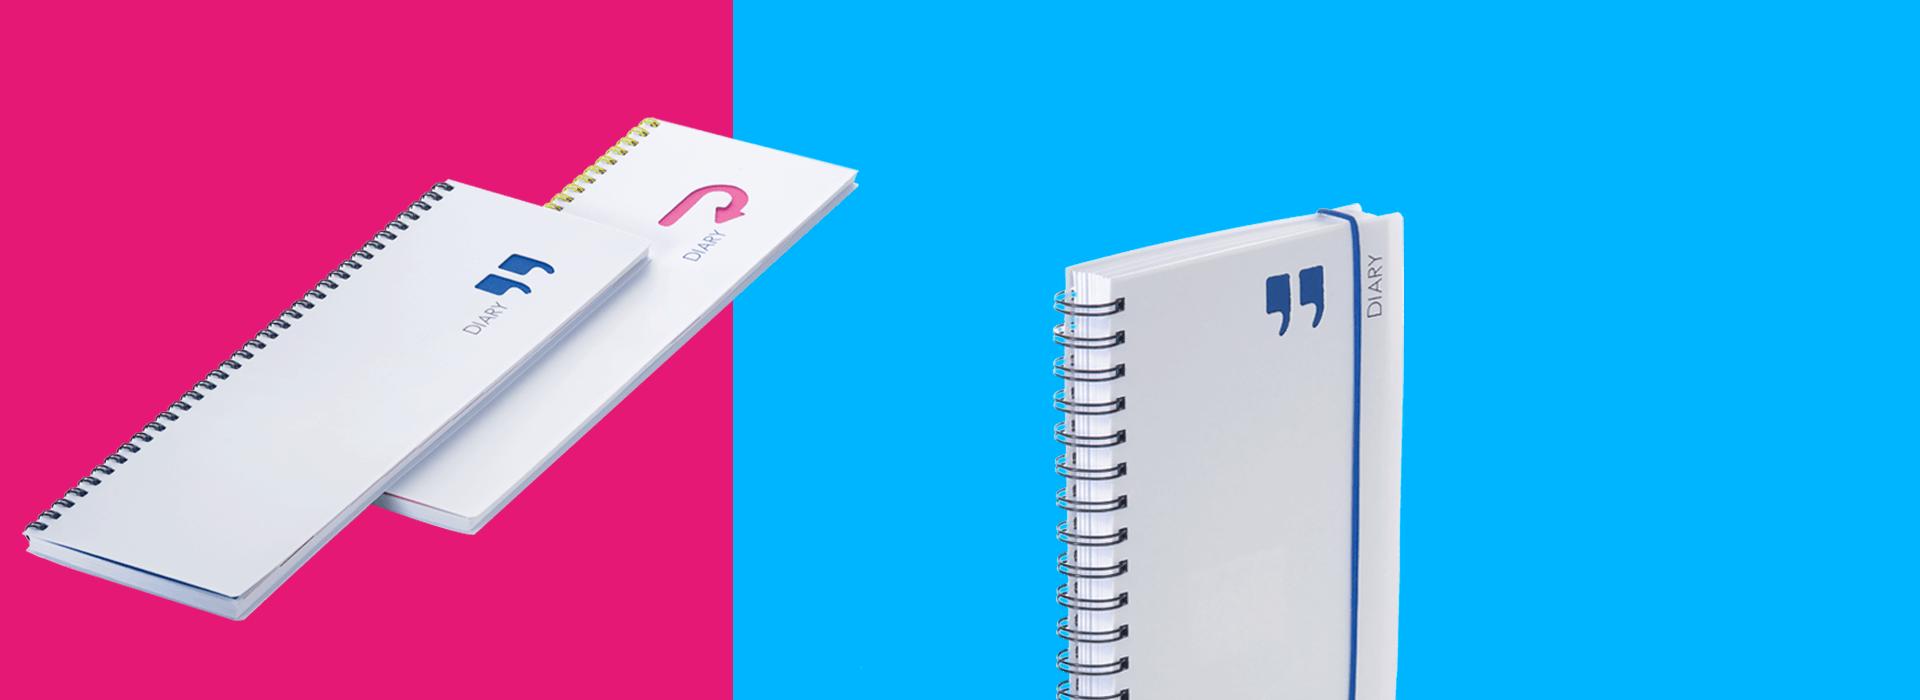 ondesign-brand-design-projectslider01